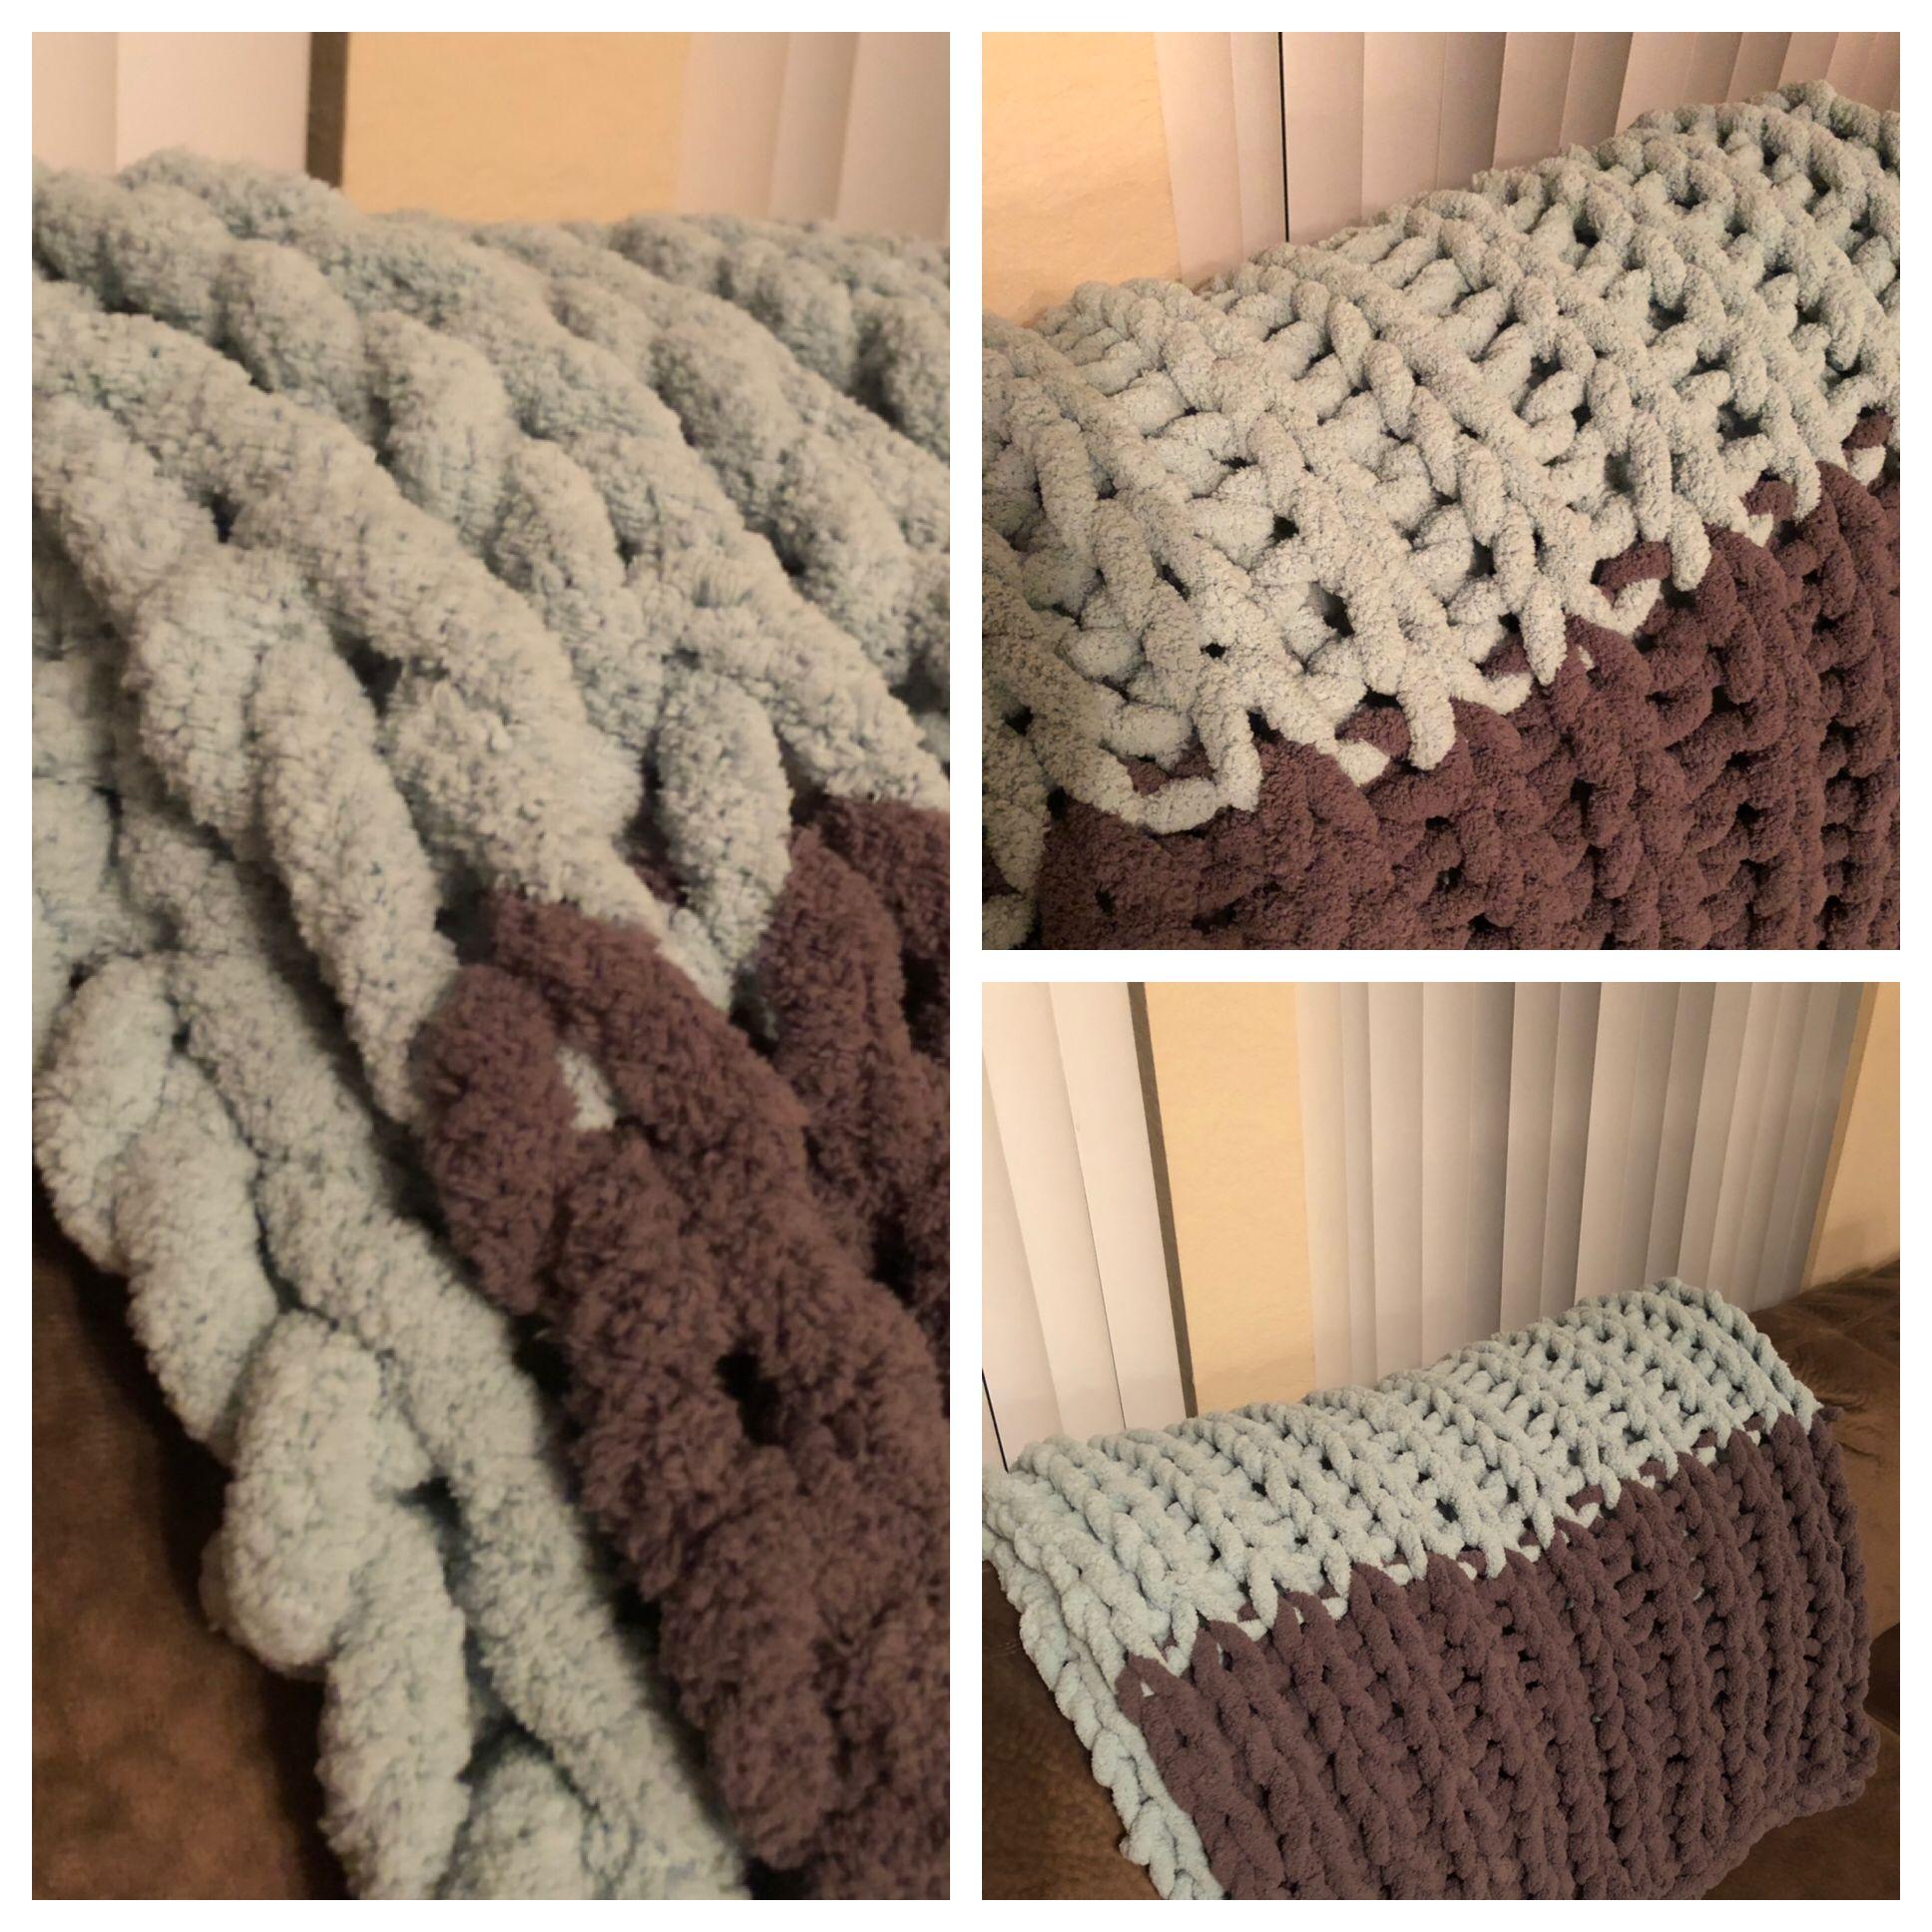 Chunky Blanket Arm Knitting Bernat Big Blanket Big Yarn From Michael S Chunky Blanket Arm Knitting Blanket Big Yarn